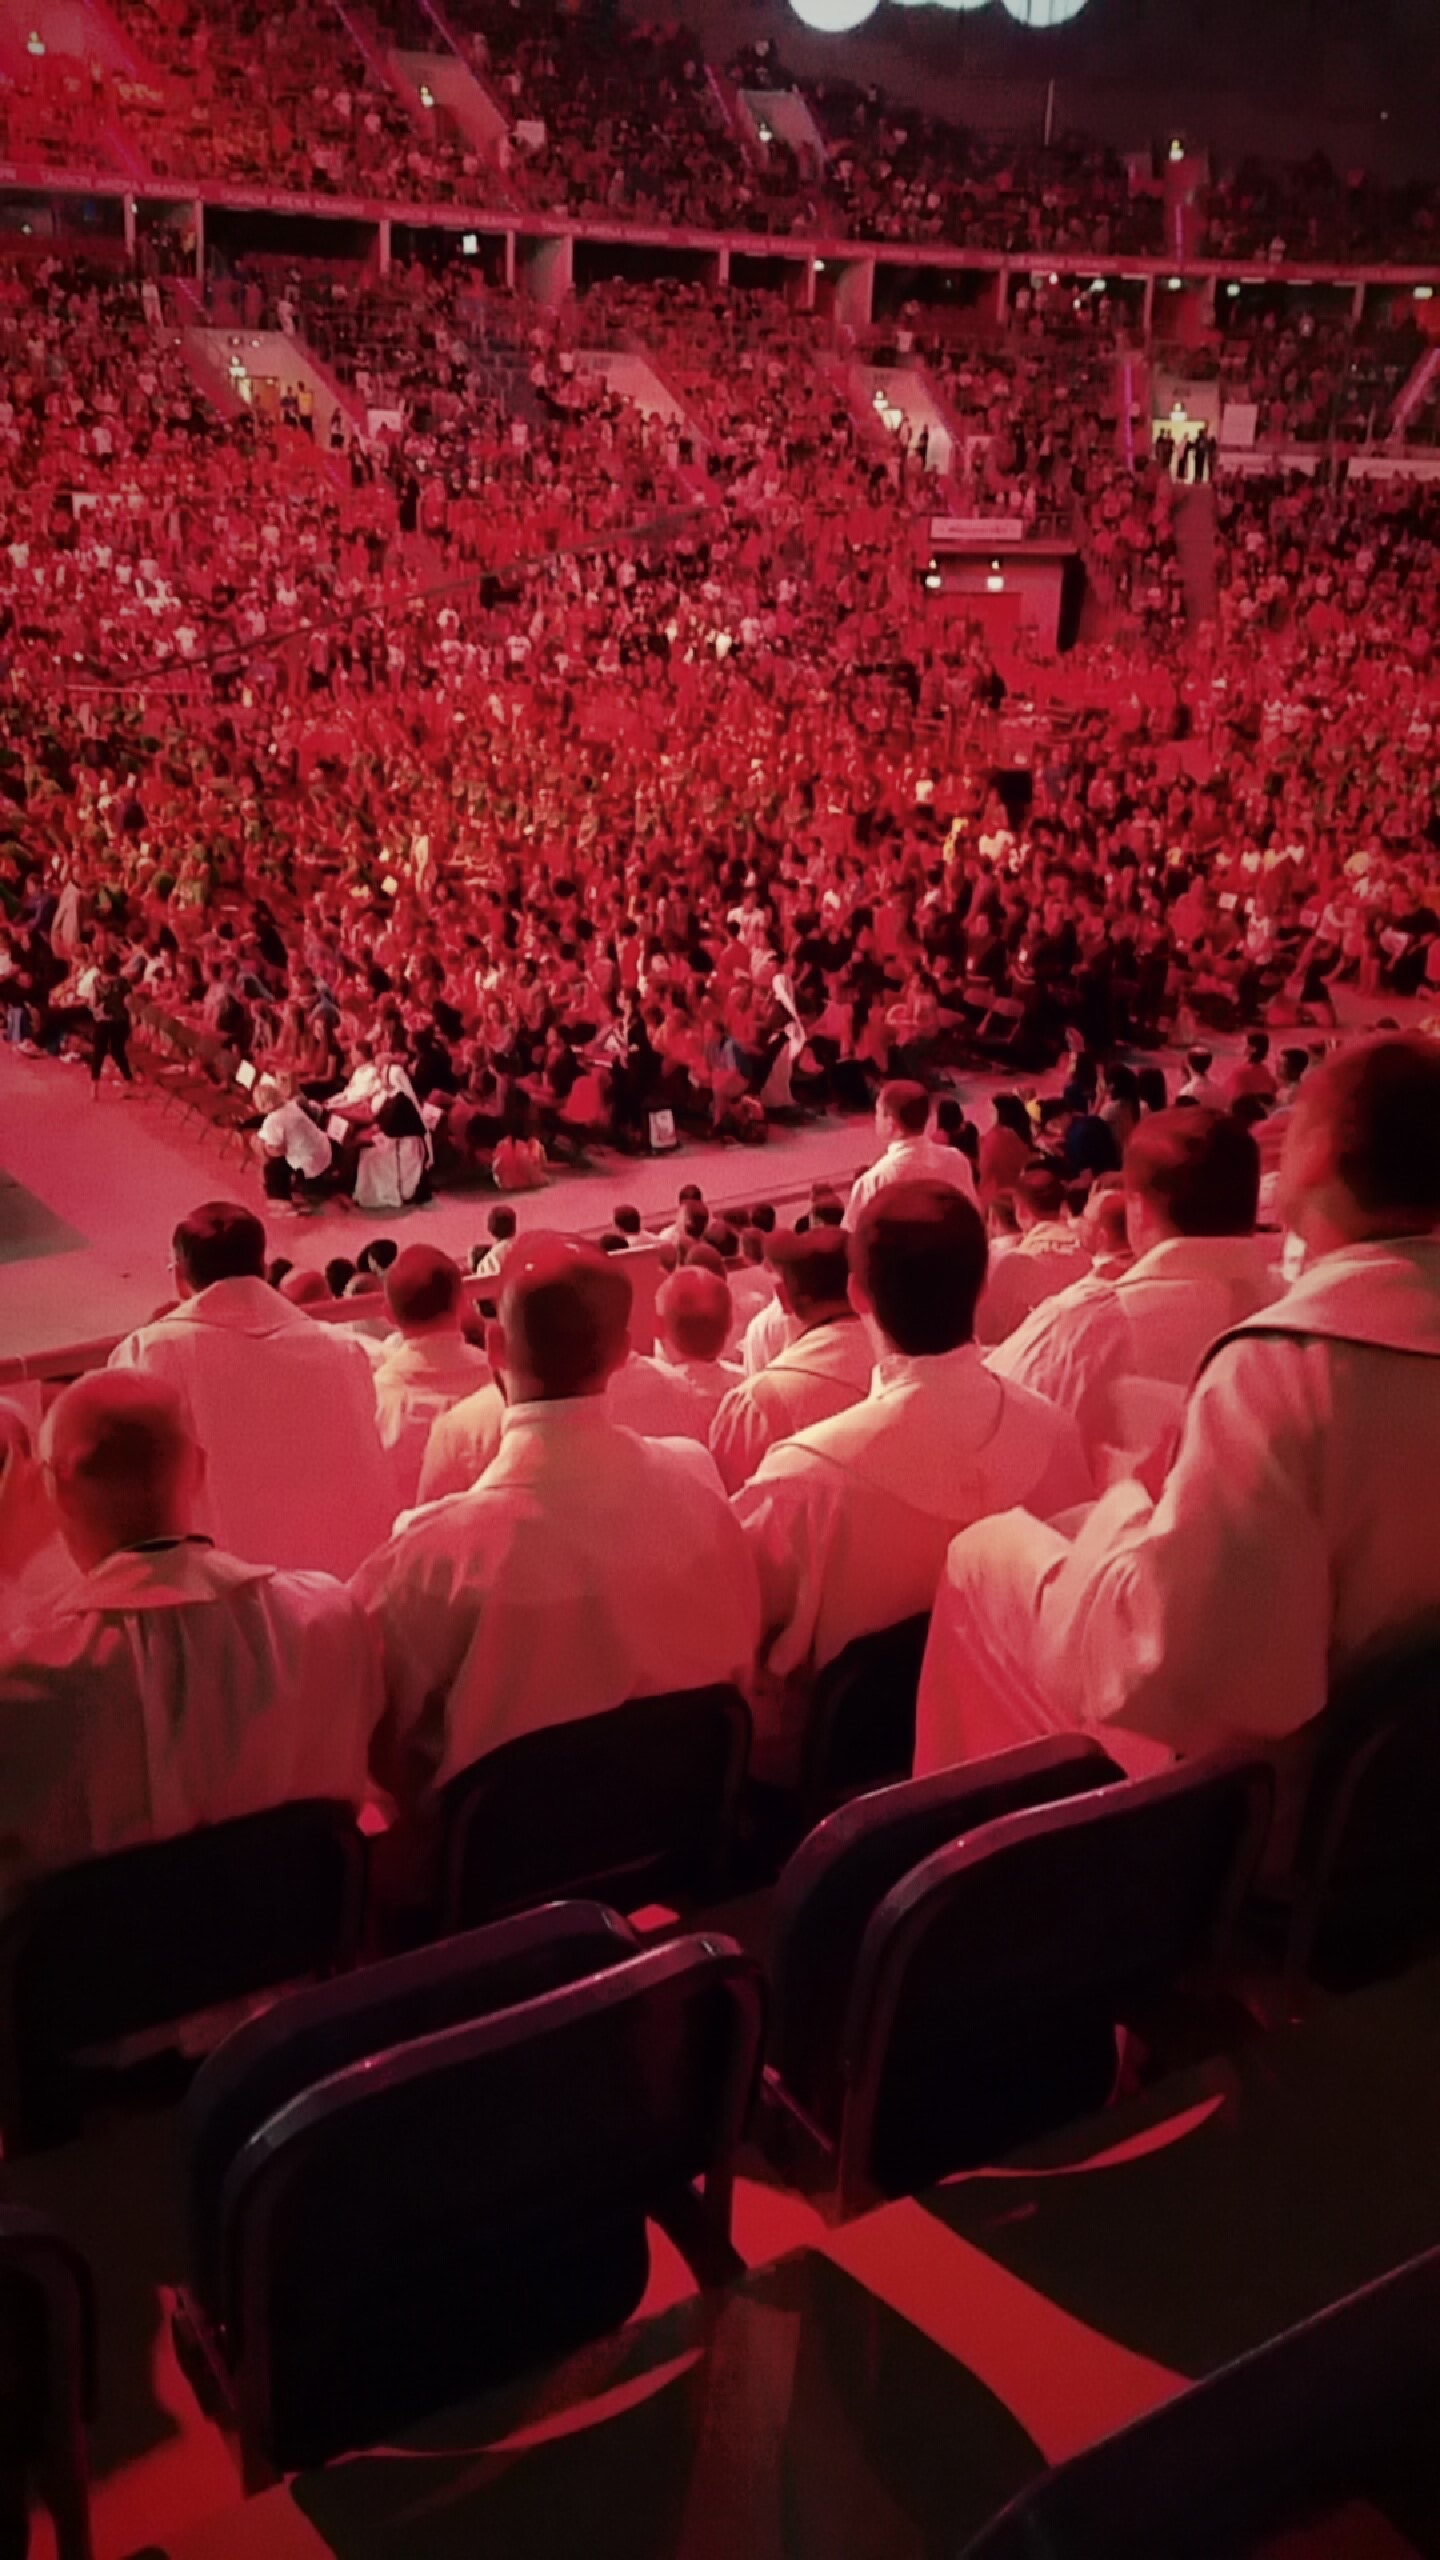 https://i0.wp.com/troubadour.francis.edu/wp-content/uploads/2016/07/Fraley-blog-5-pic-WYD-crowd.jpg